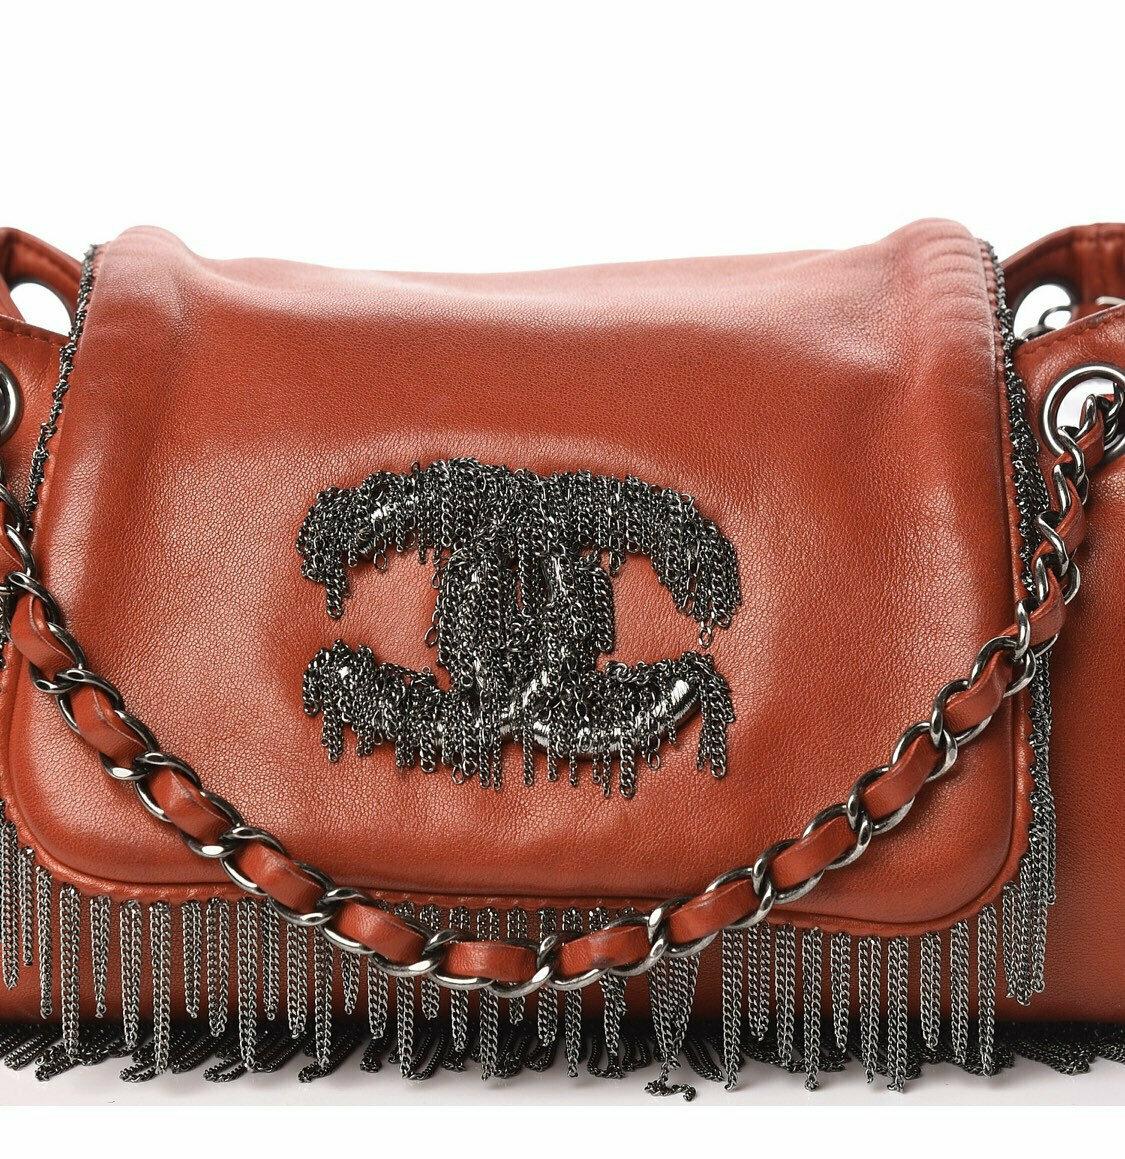 Vintage CHANEL Red Leather CC Logo Chain Fringe Shoulder Crossbody Collectors Bag! Rare! Rock n Roll